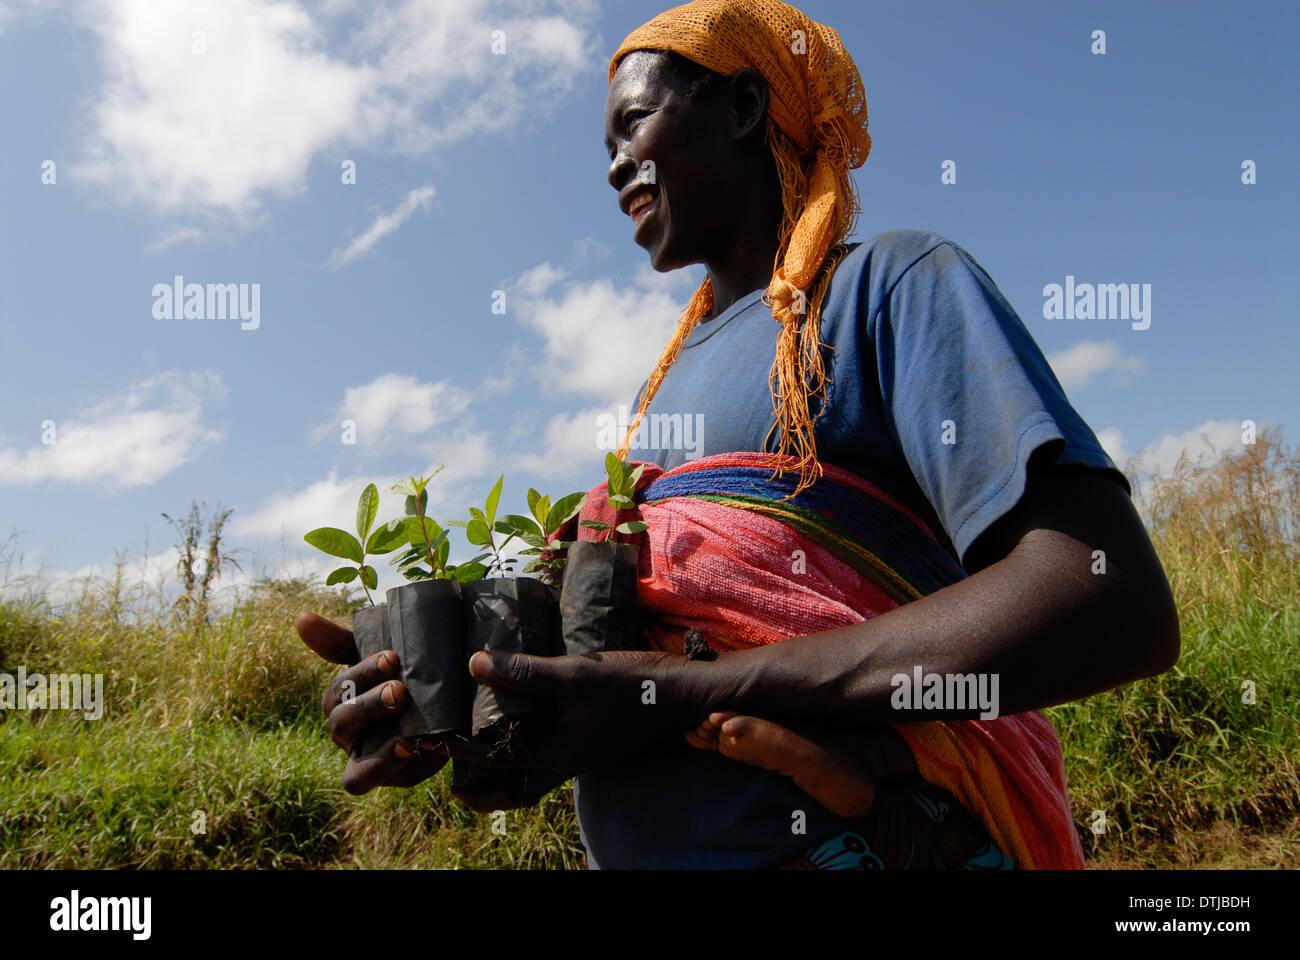 UGANDA Kitgum , woman with tree seedlings - Stock Image